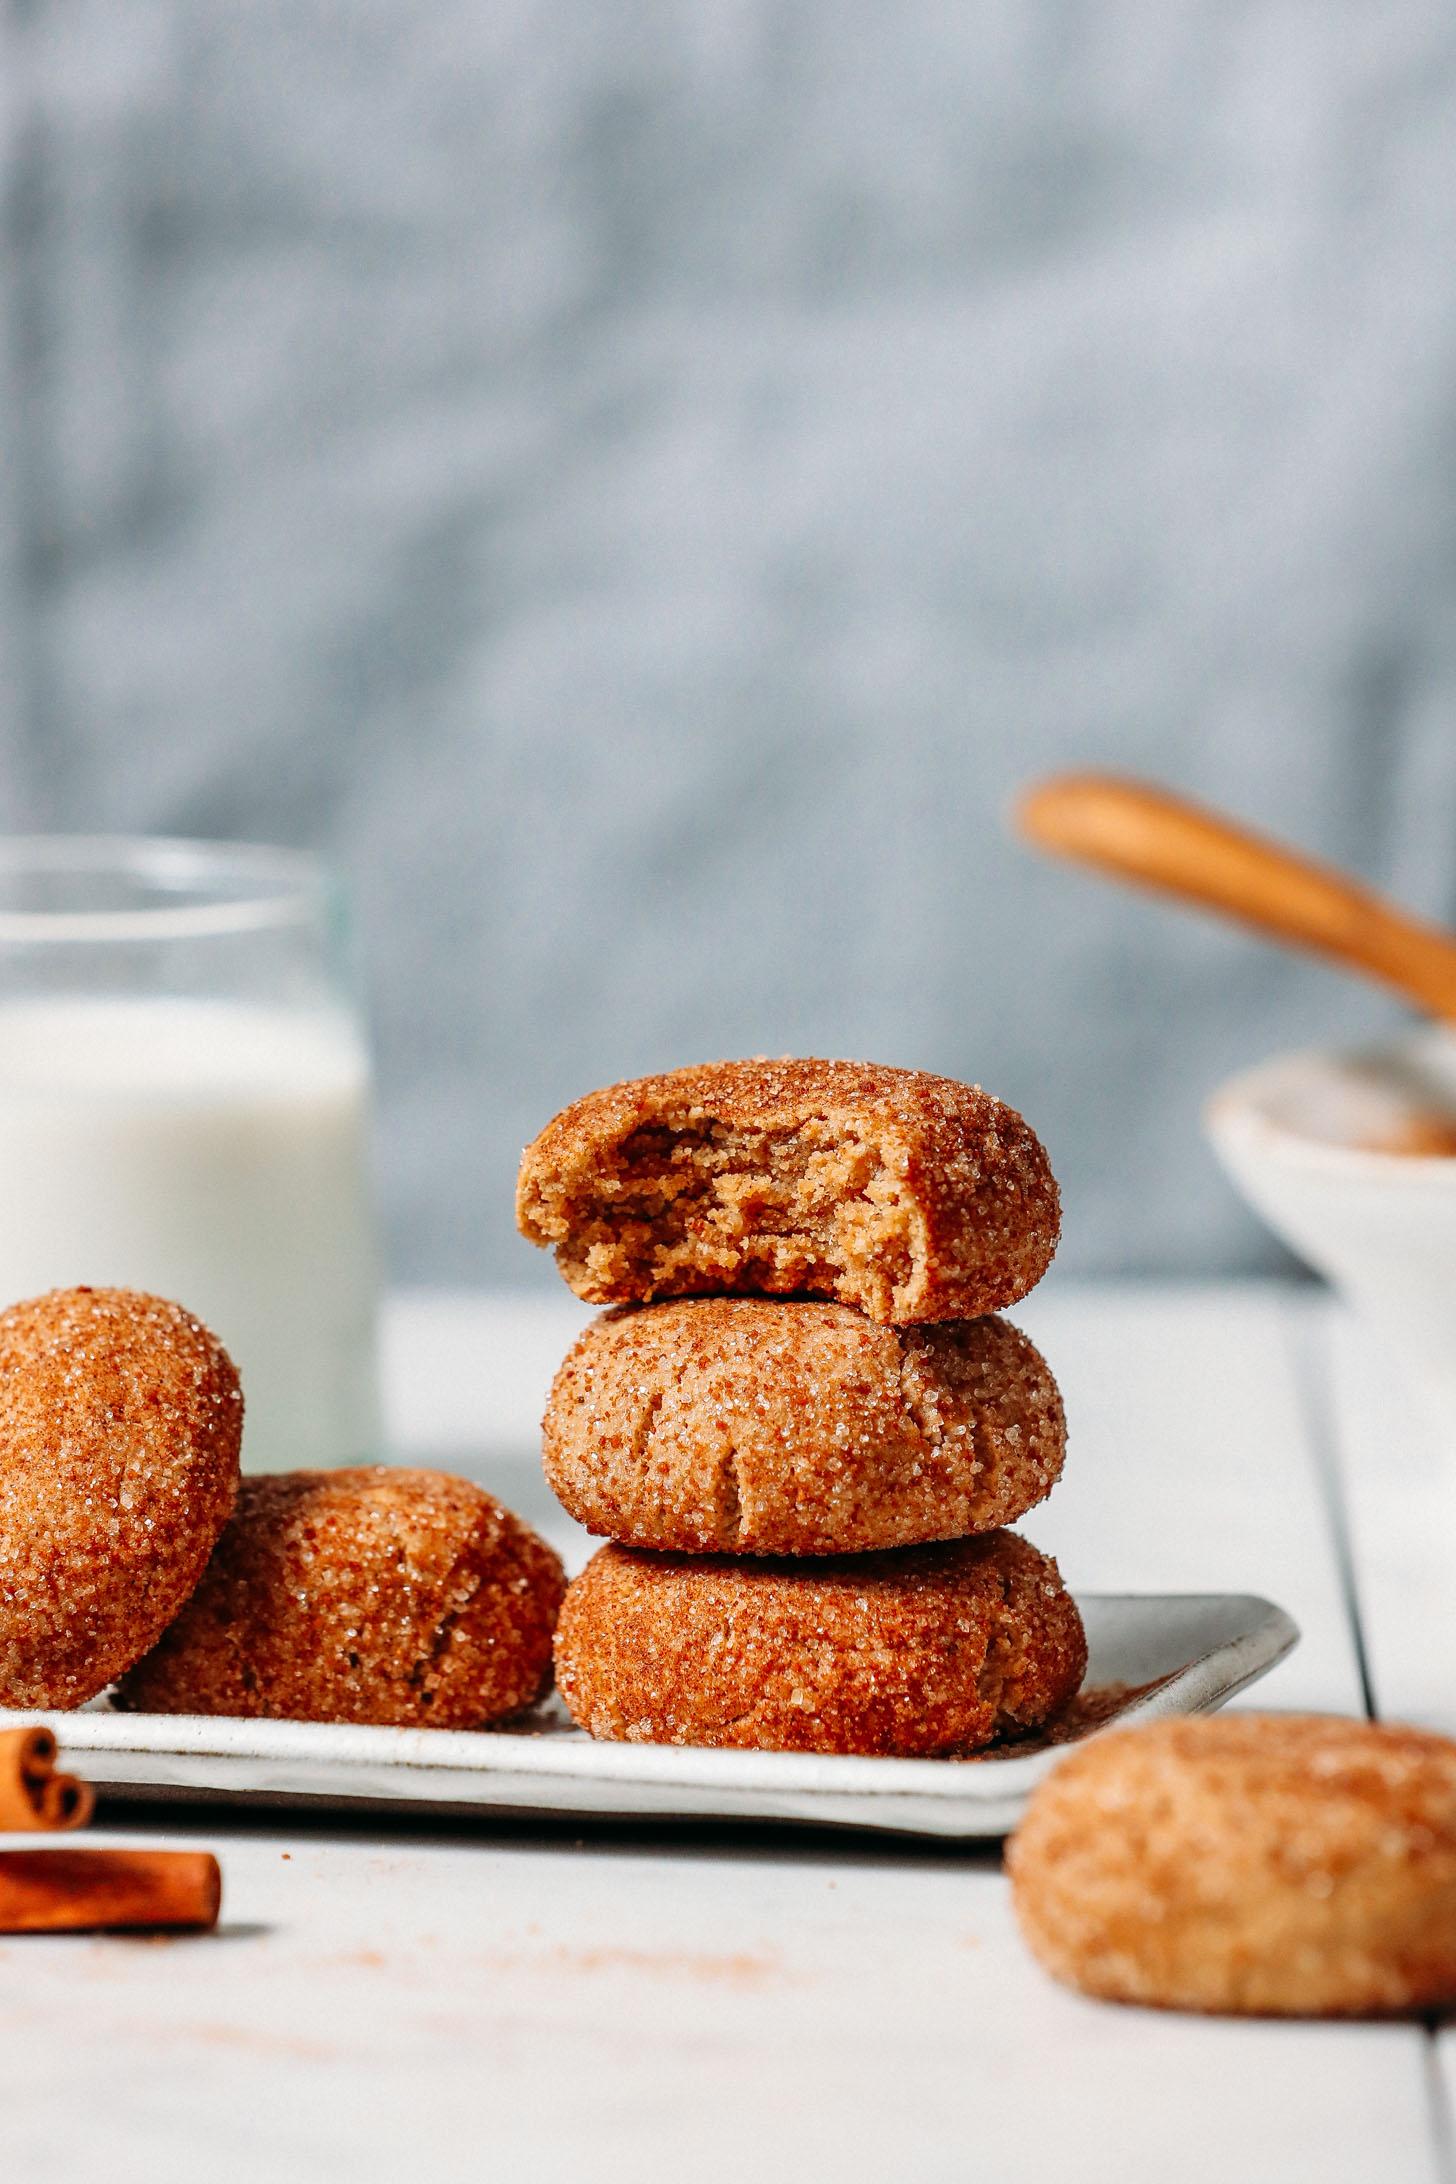 Plate of gluten-free snickerdoodle cookies